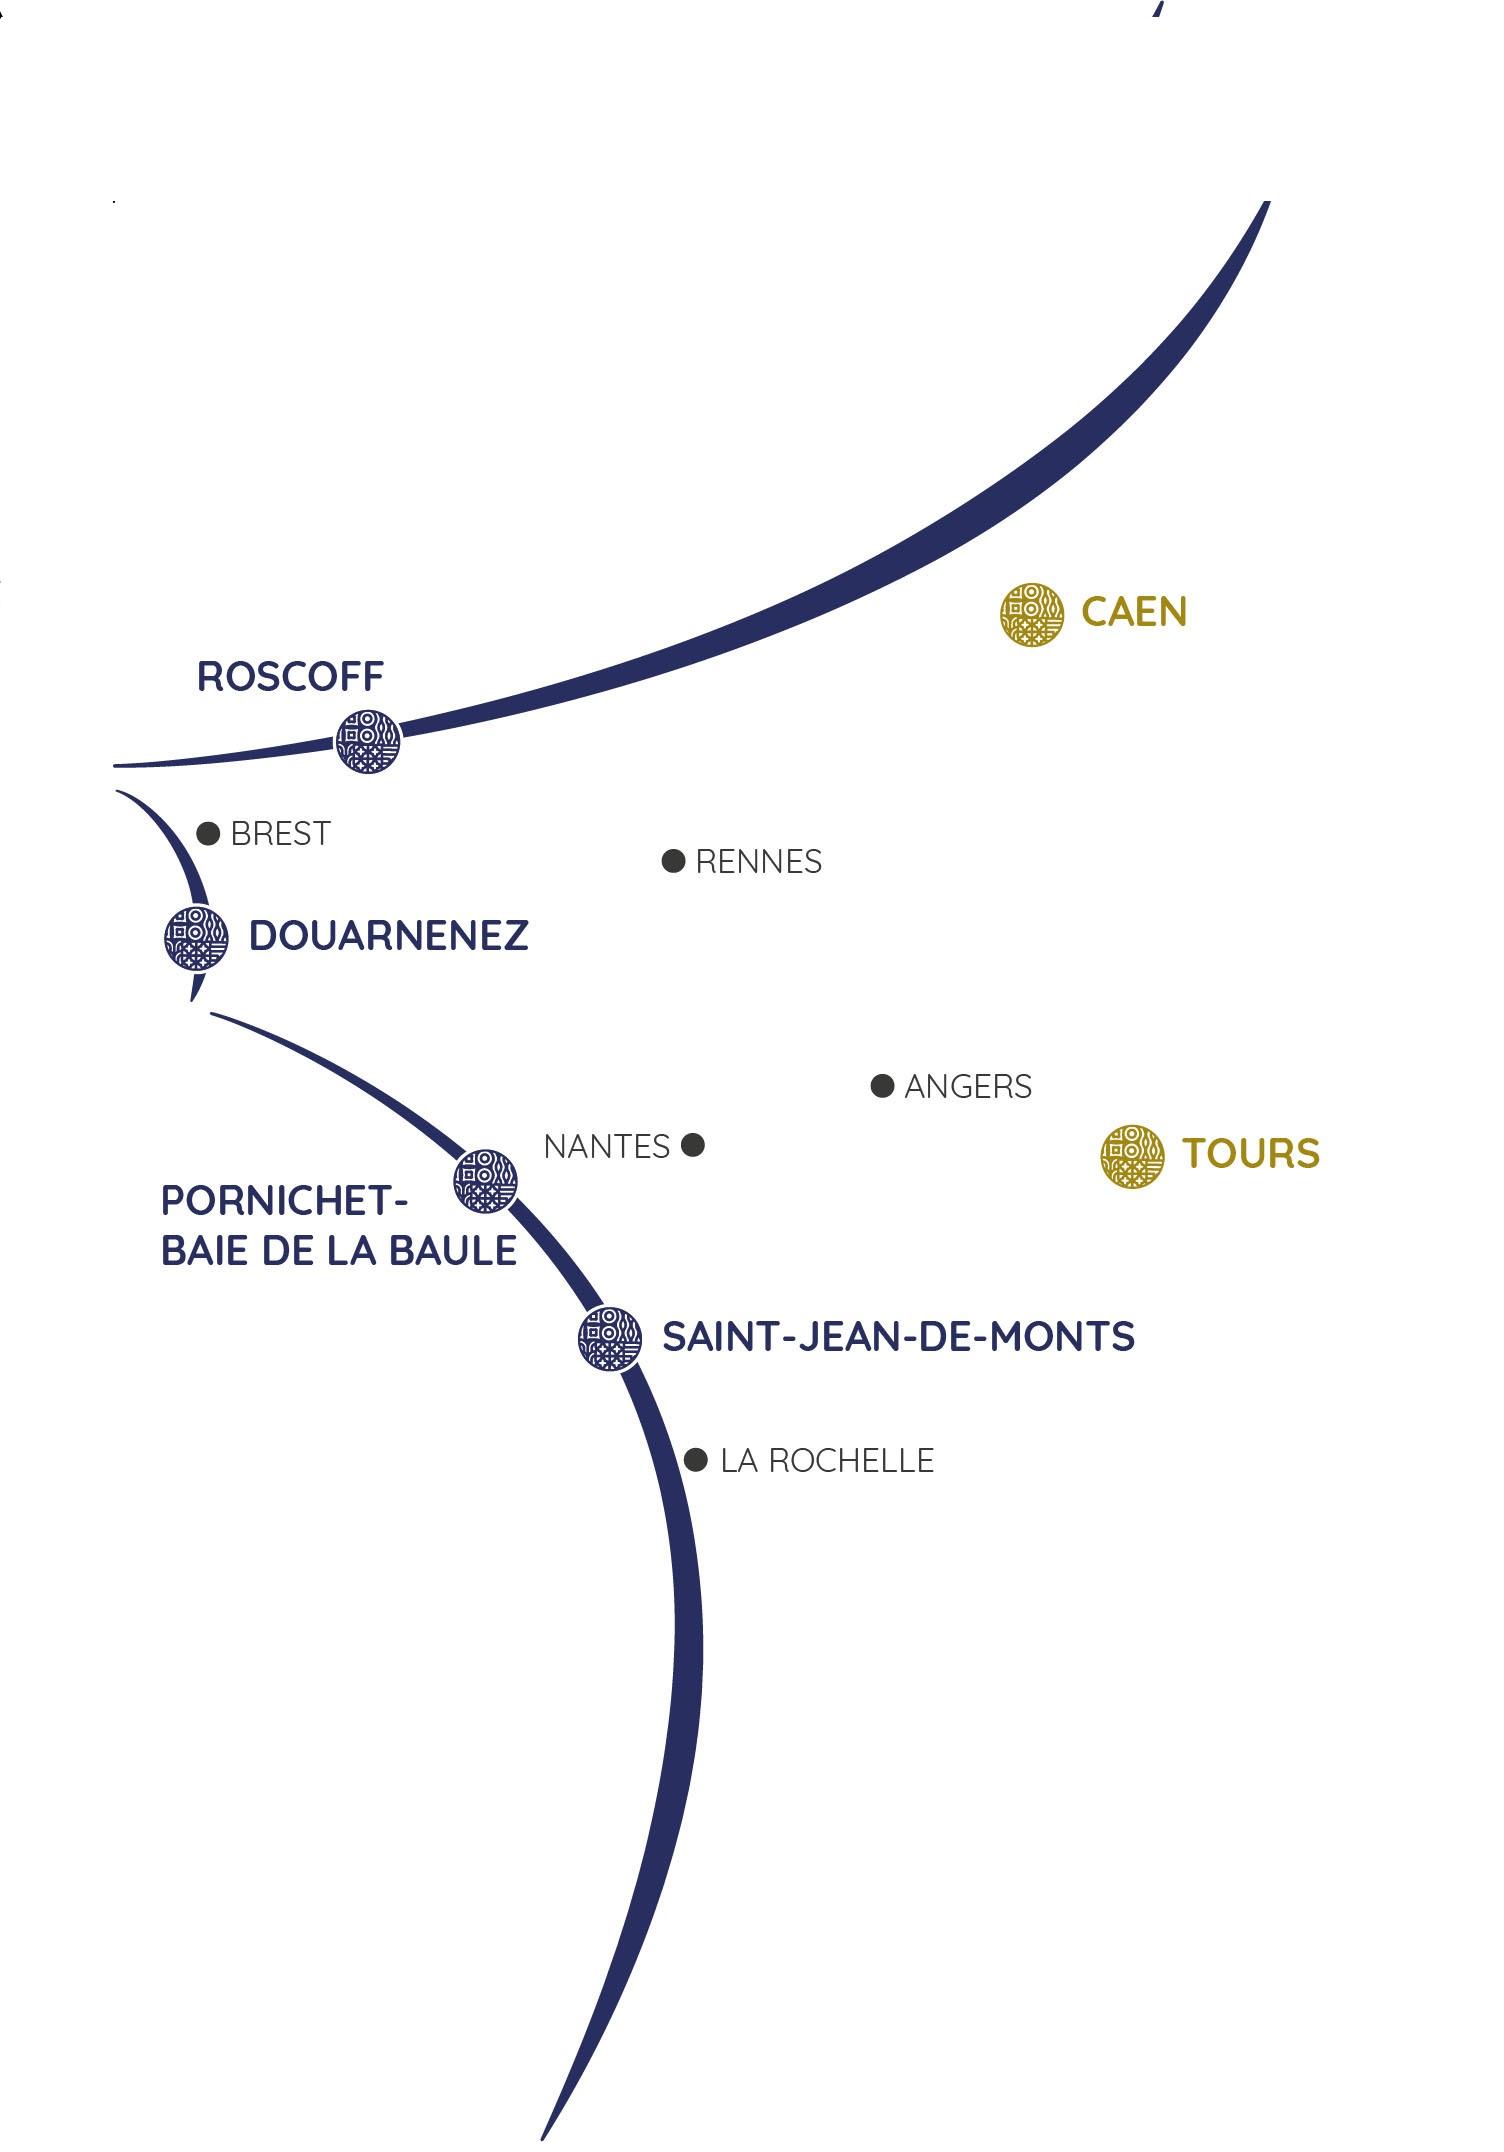 carte--france-offre-complete-convertimage-3.jpg